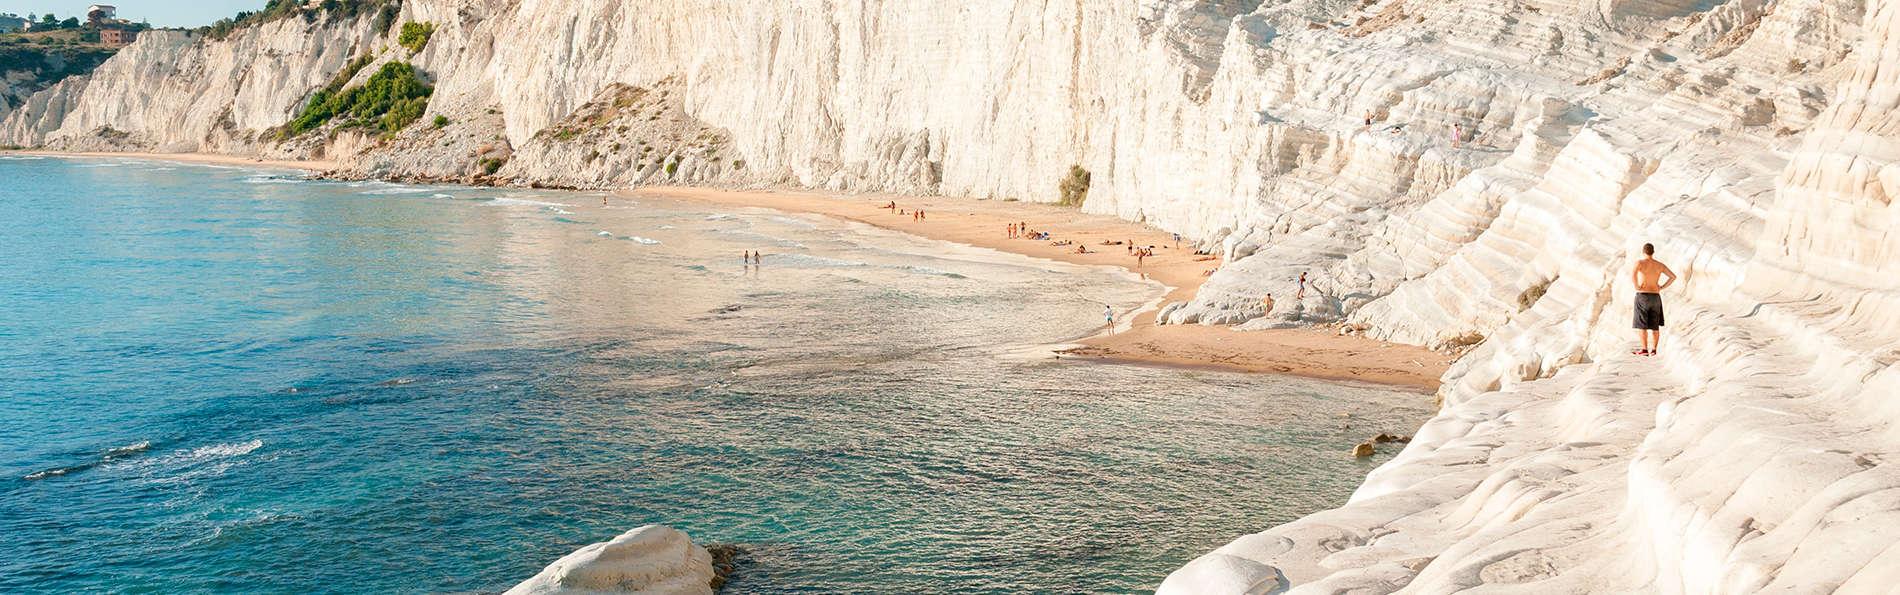 Scala dei Turchi Resort - EDIT_destination3.jpg